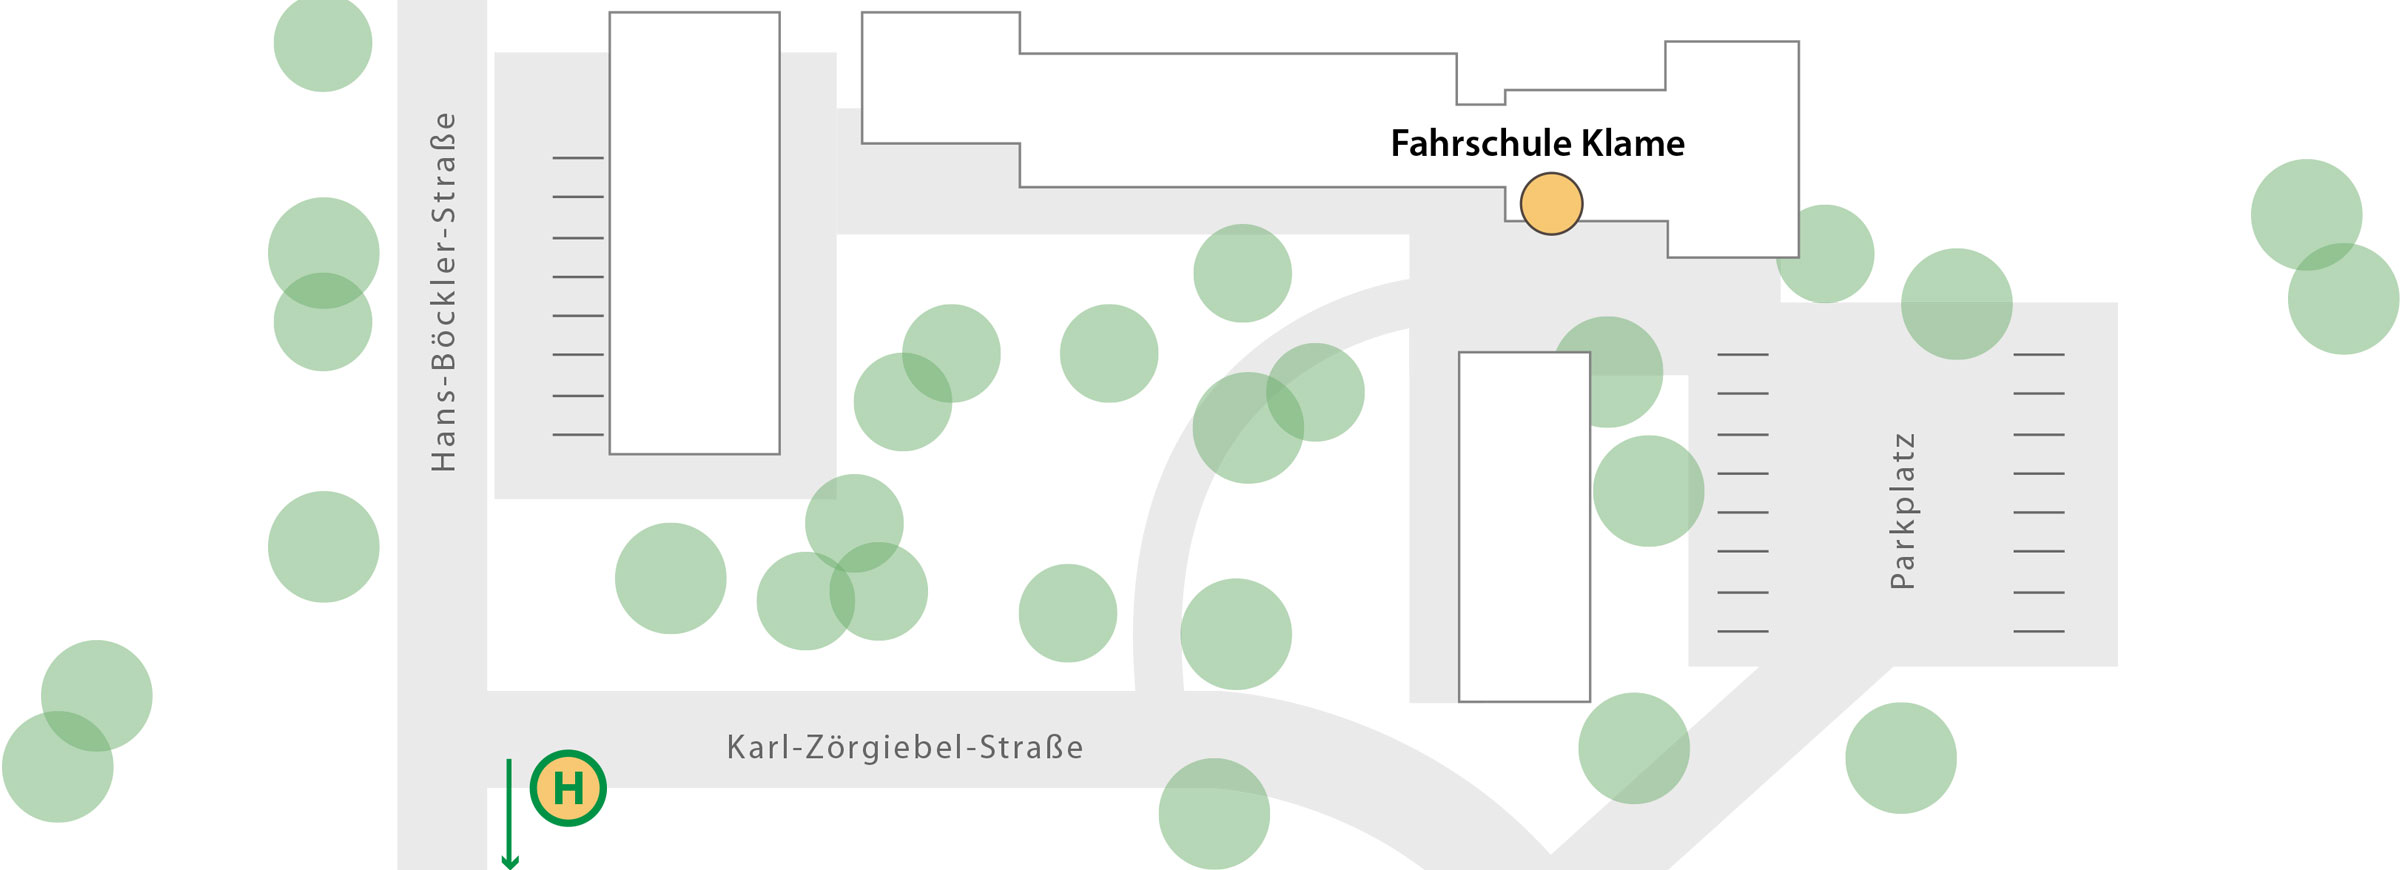 Fahrschule Klame Lageplan